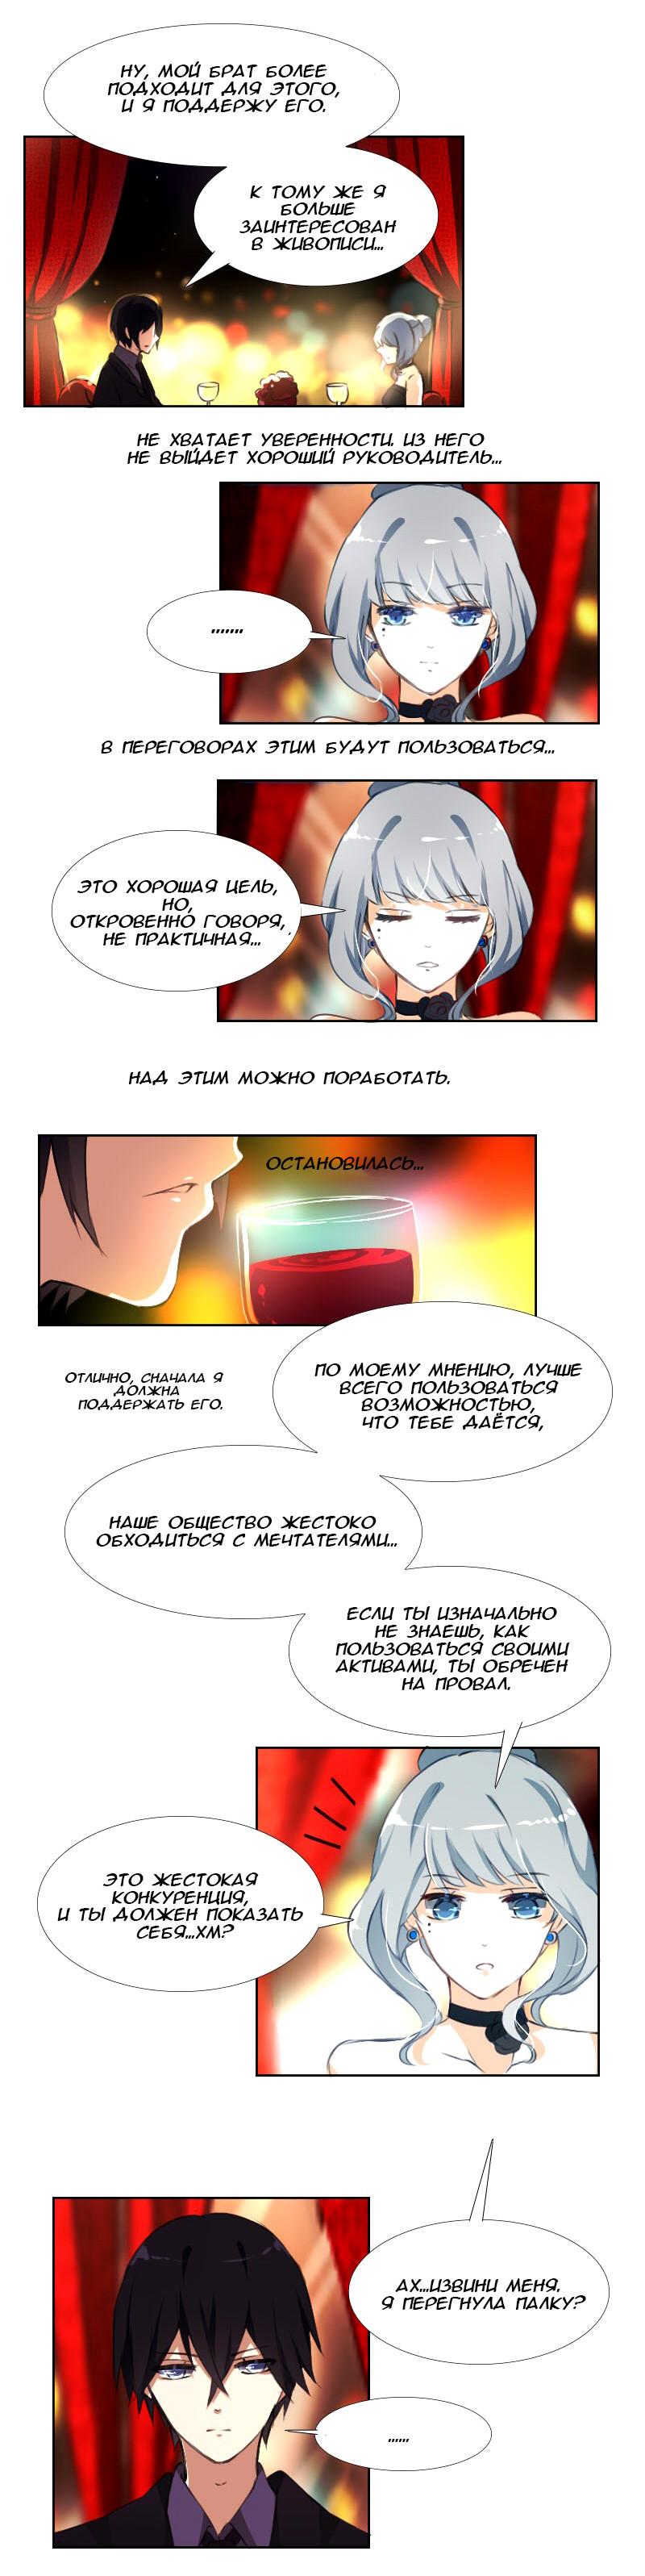 https://r1.ninemanga.com/comics/pic2/43/31851/315552/1483437932773.jpg Page 6